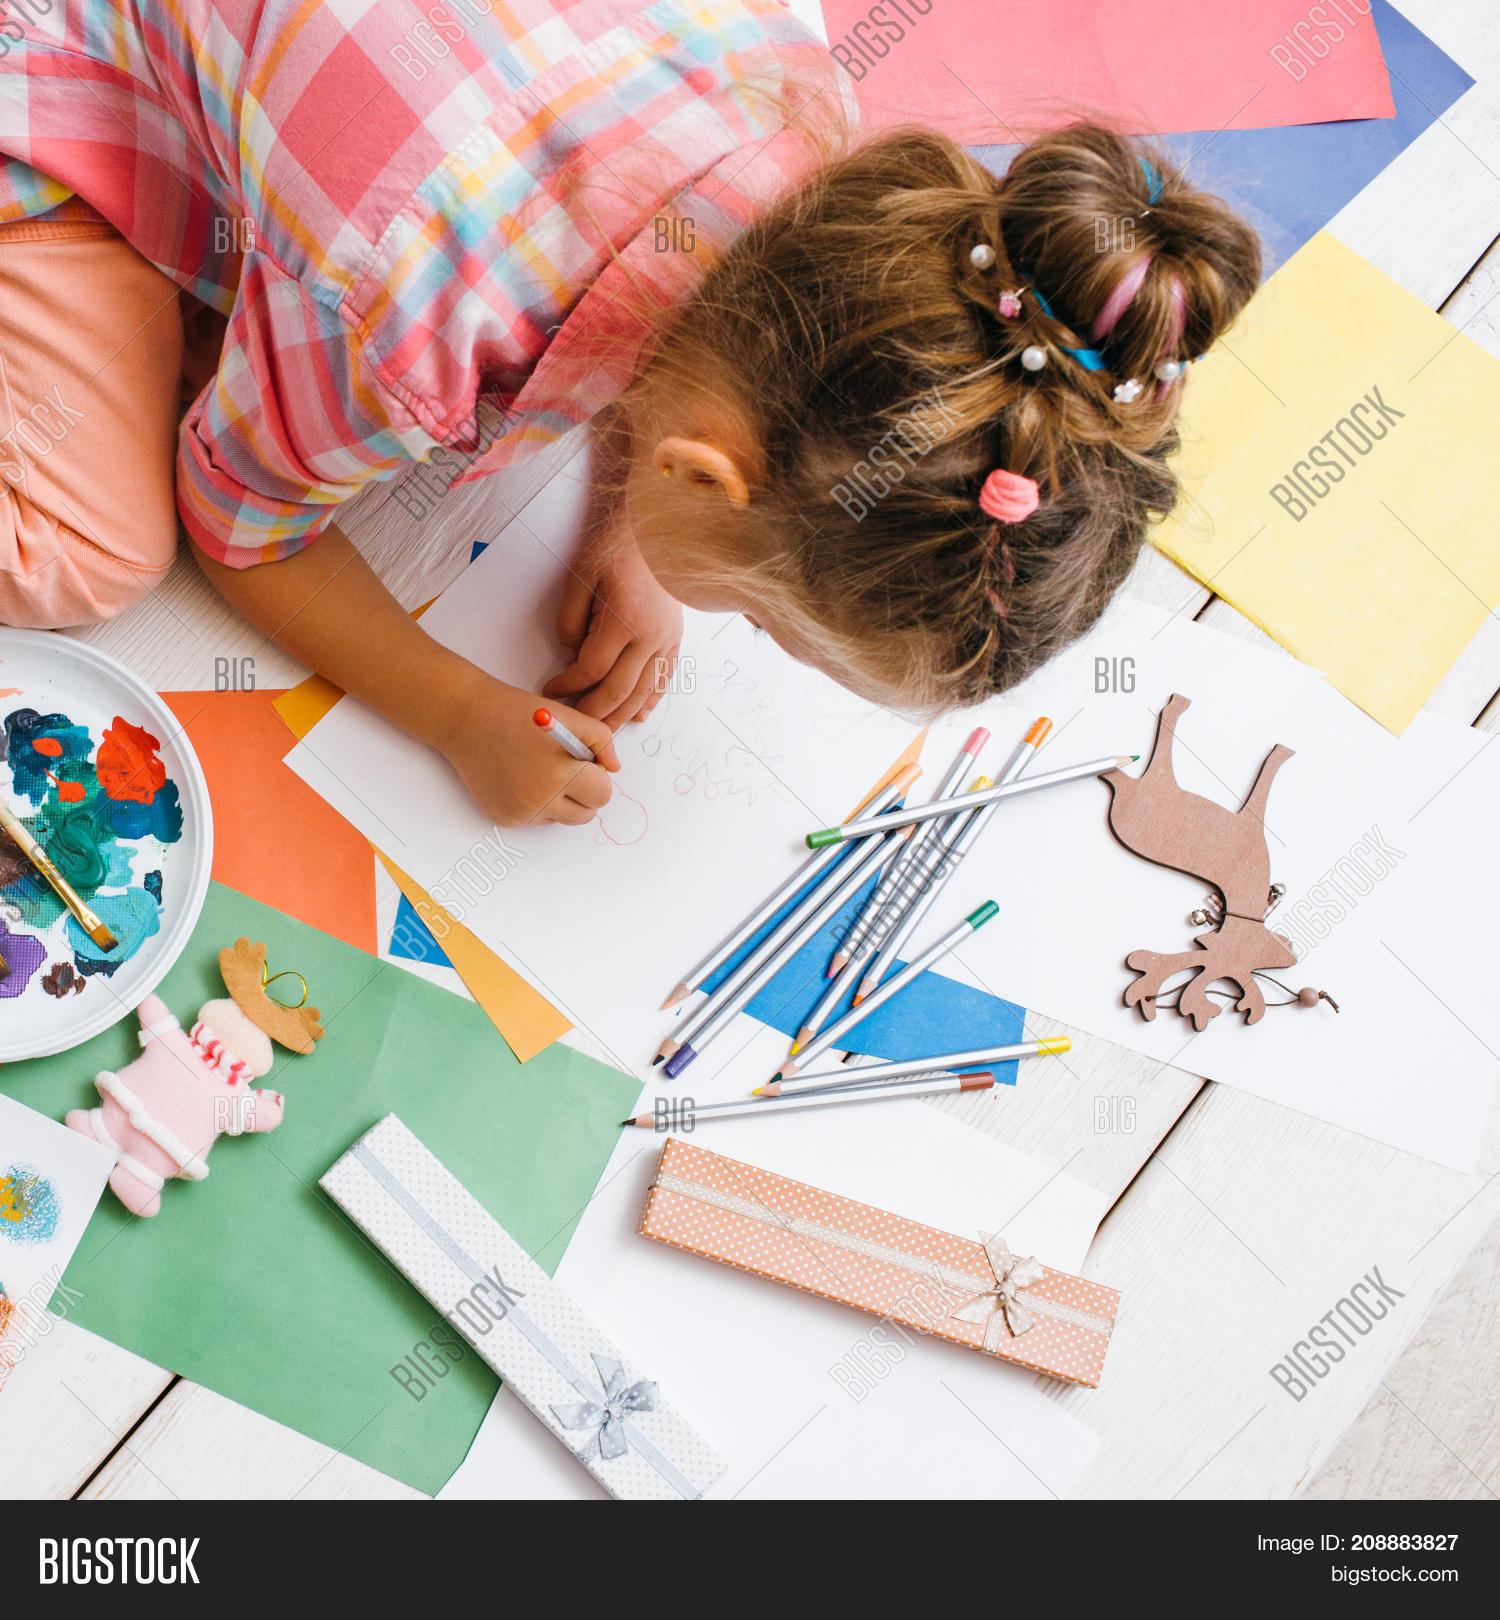 Handmade Kids Image Photo Free Trial Bigstock